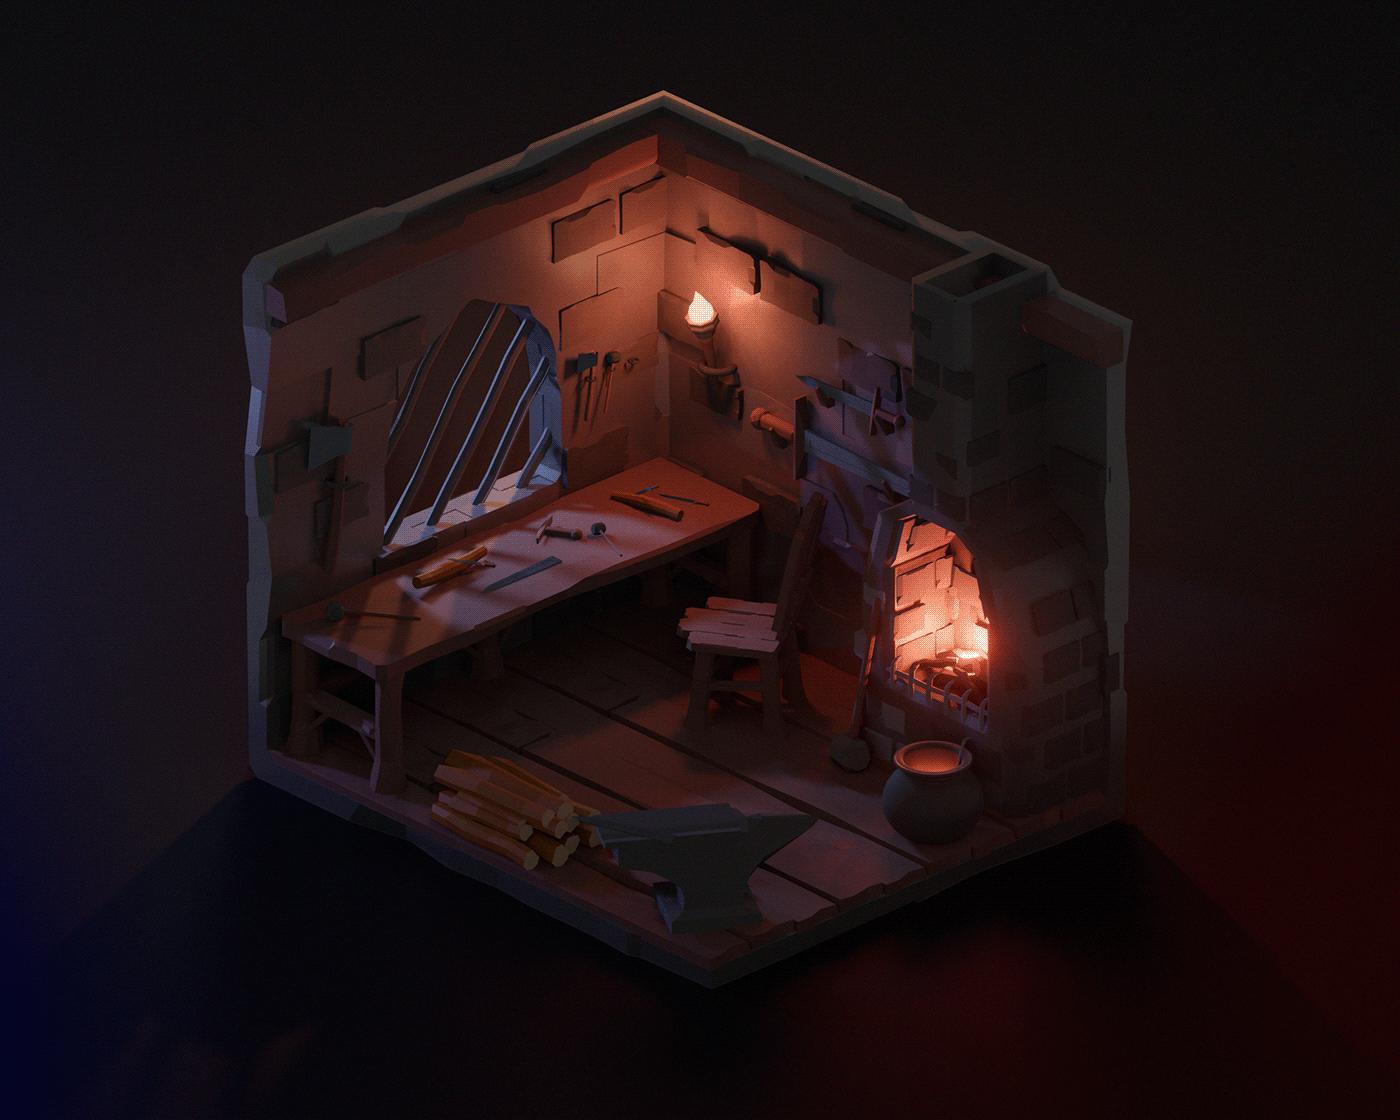 art blender Castle gameart Minimalism